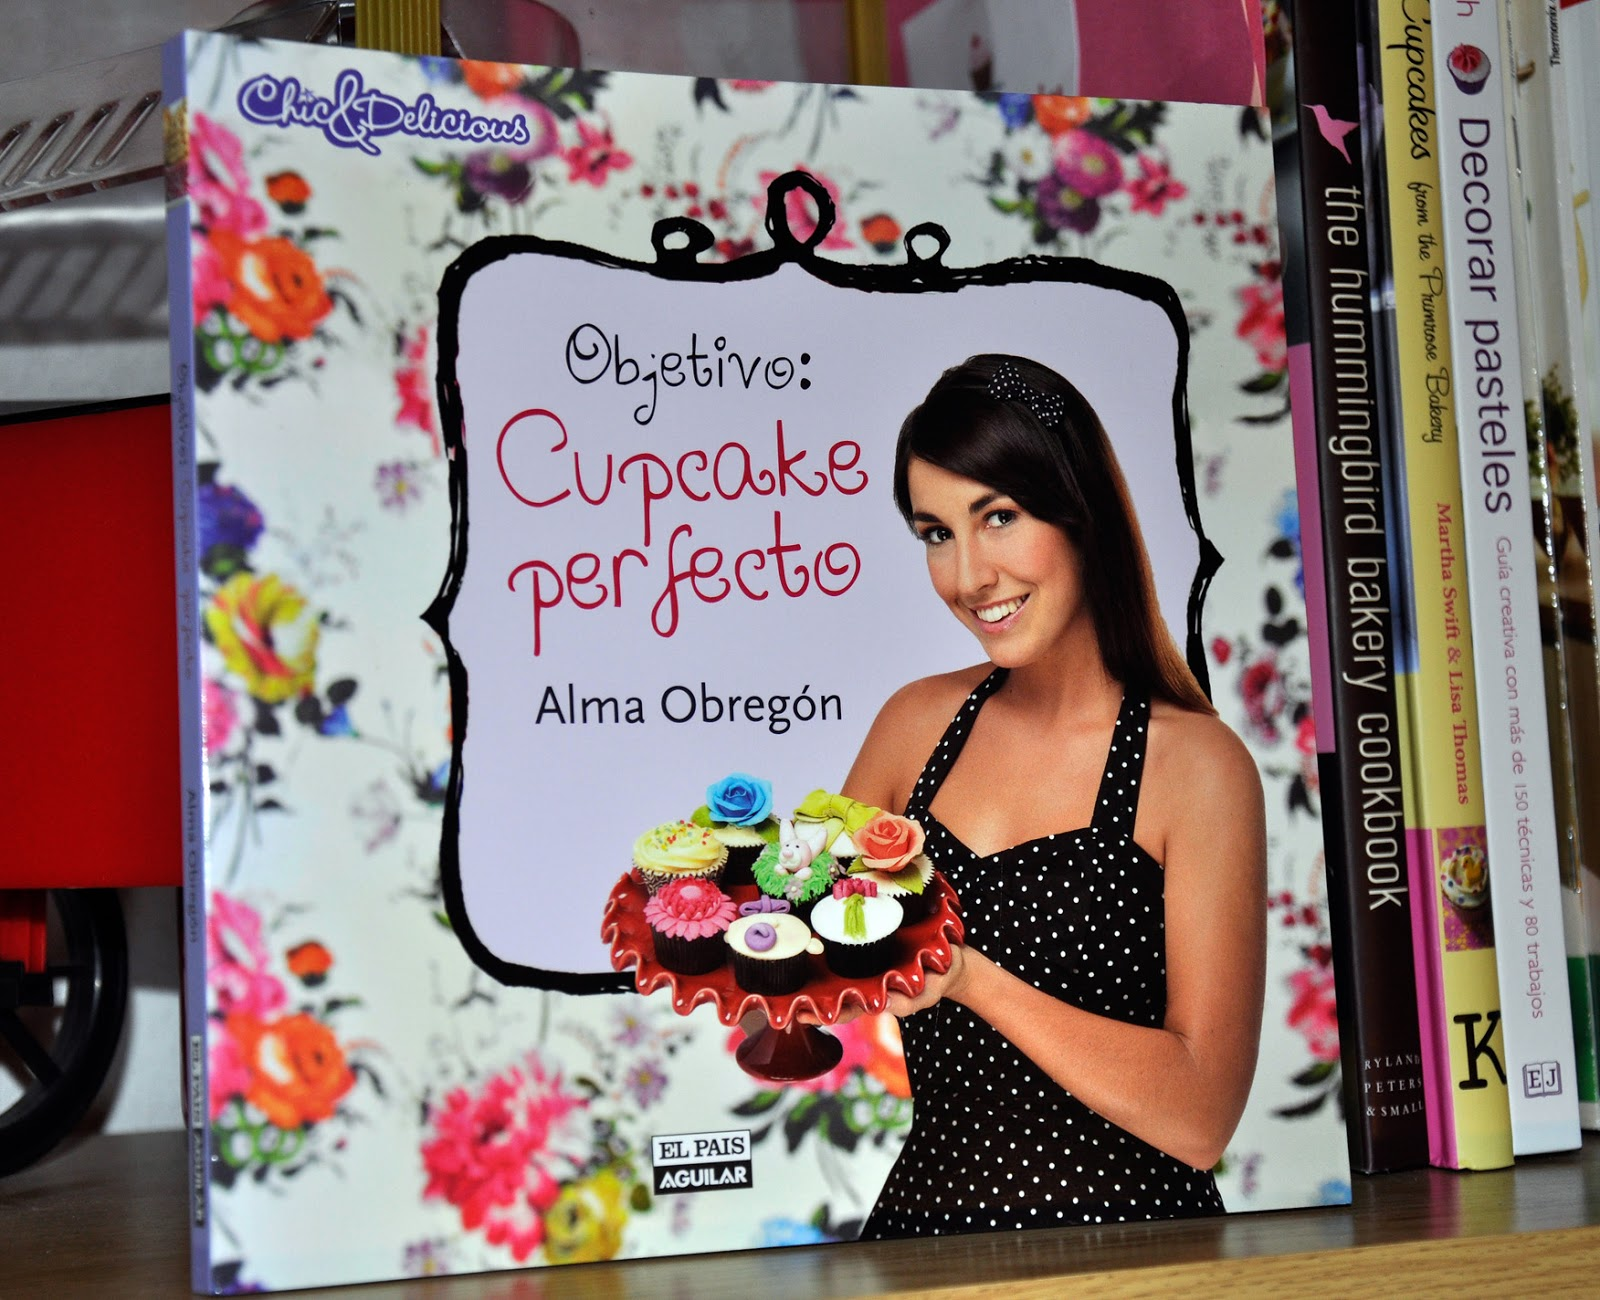 Yolita 39 s kitchen reto objetivo cupcake perfecto - Objetivo cupcake perfecto blog ...